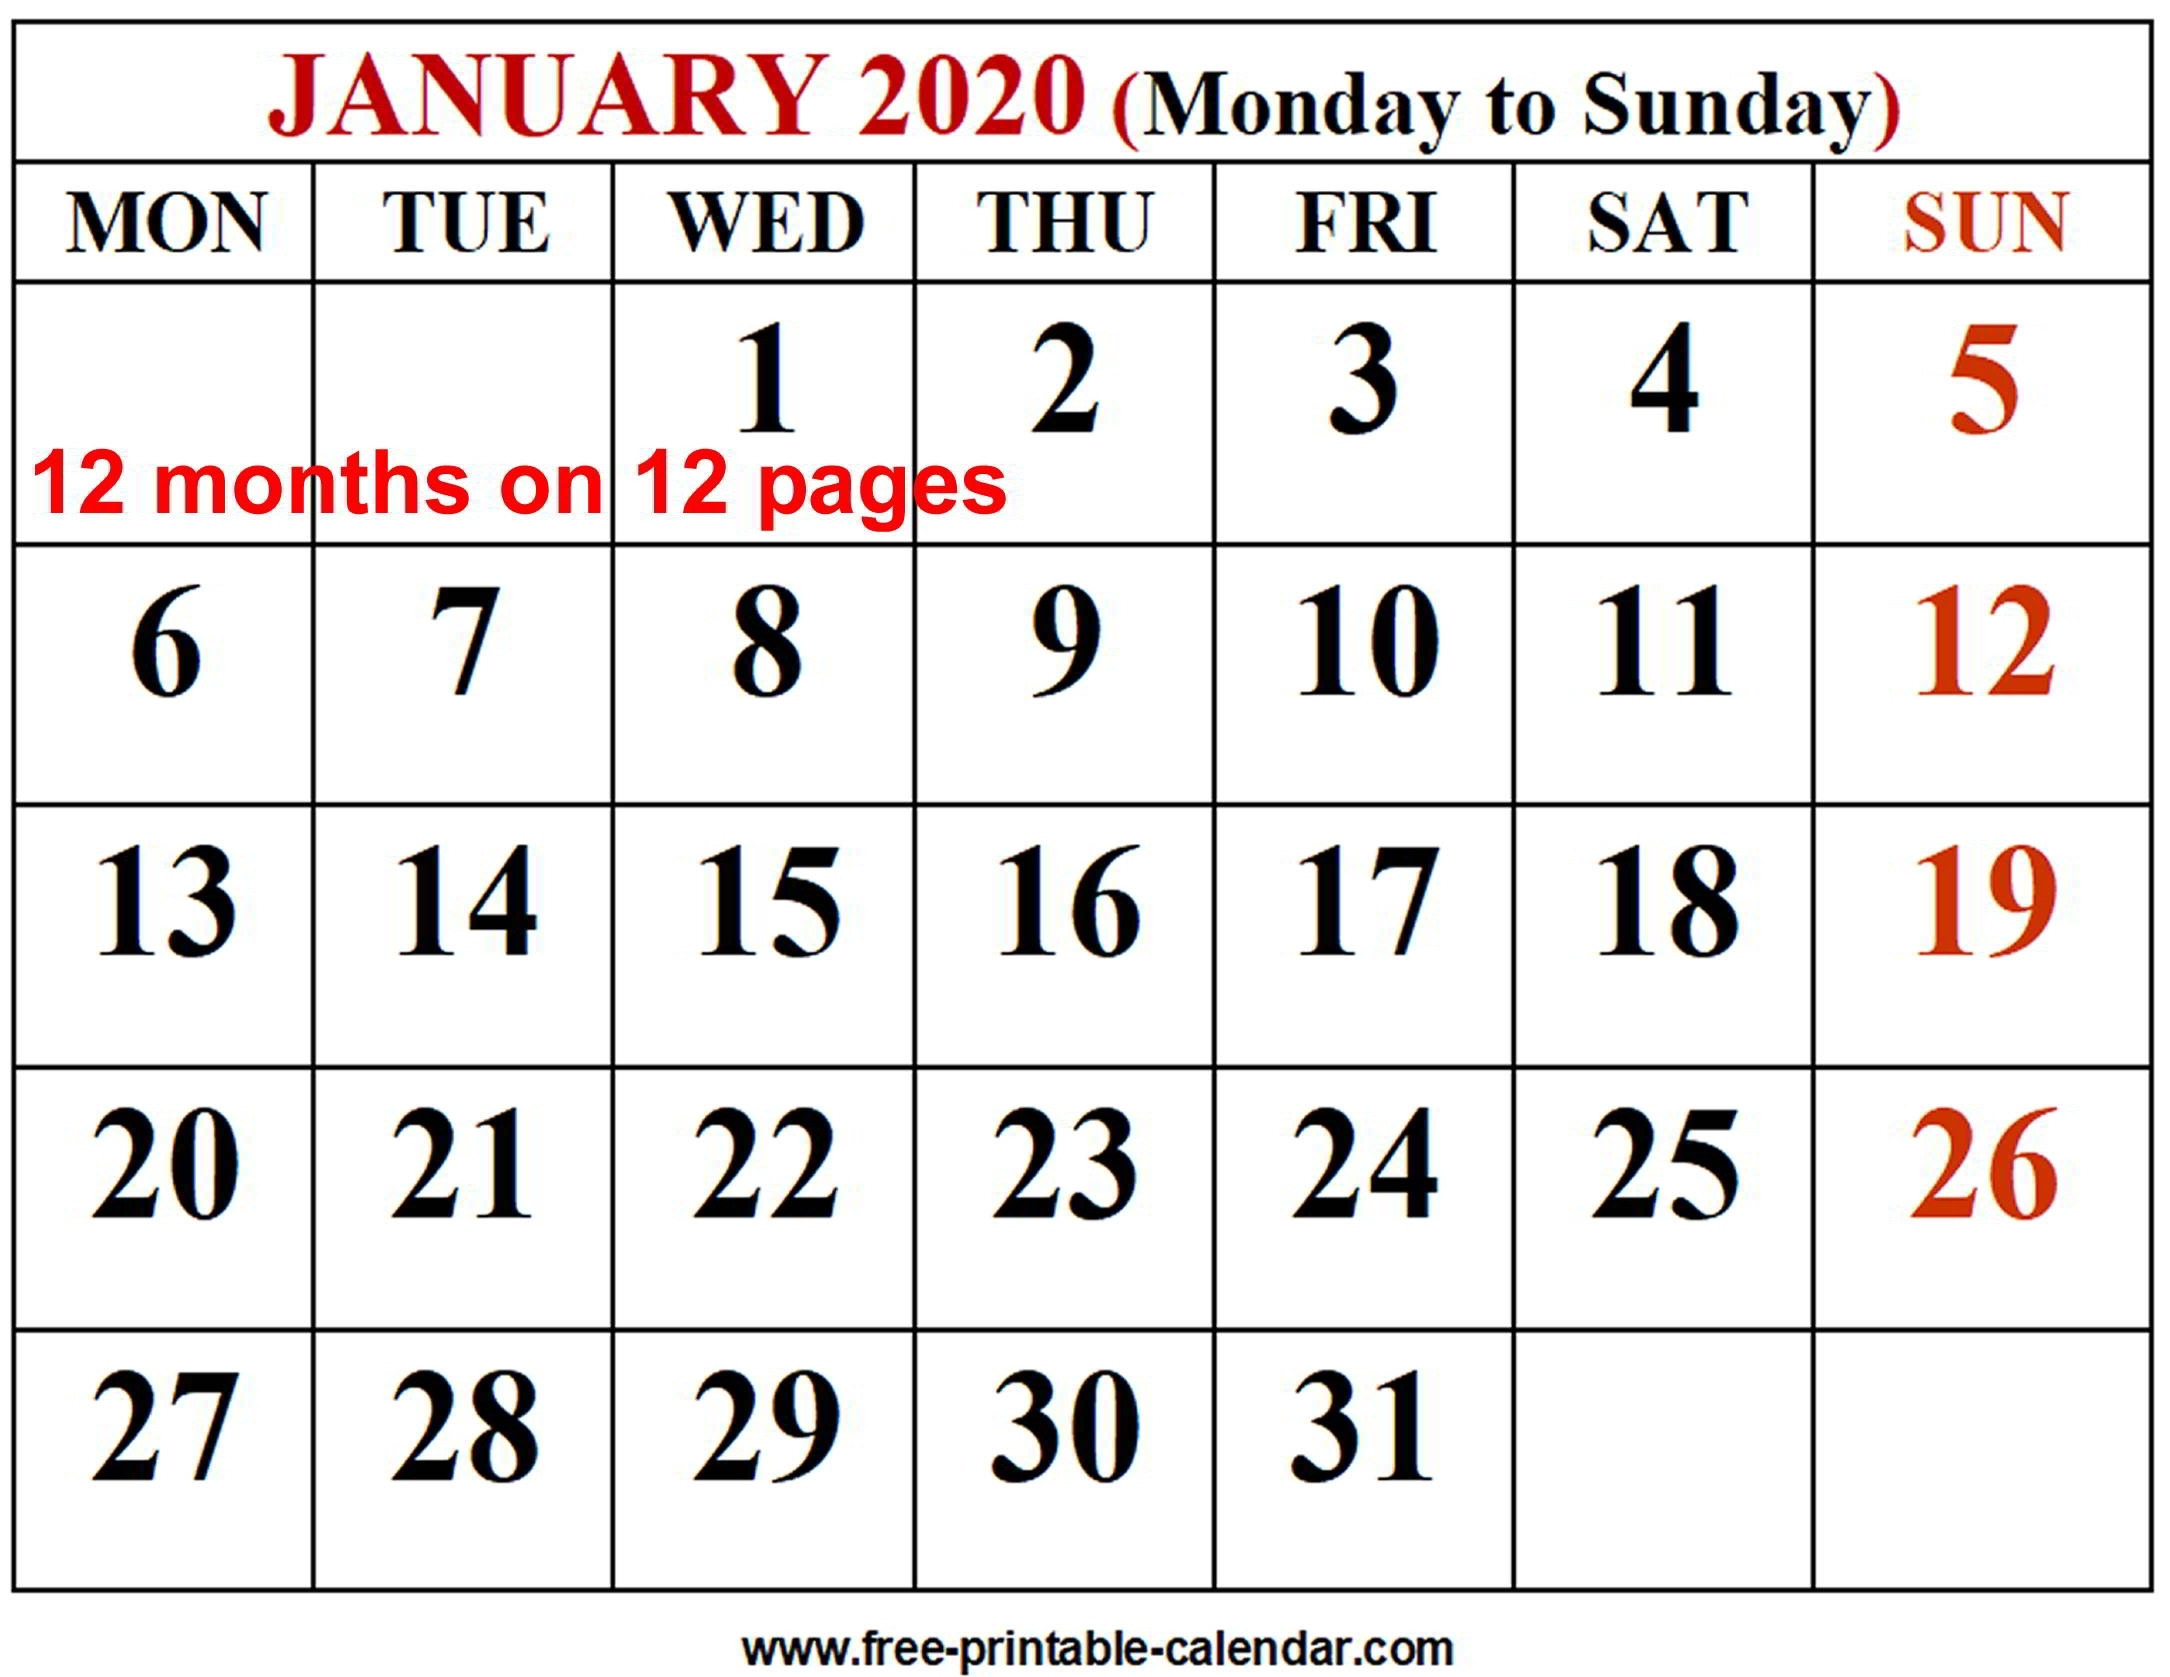 Free Printable 3 Month Calendar 2020 – Urgup.ewrs2018-4